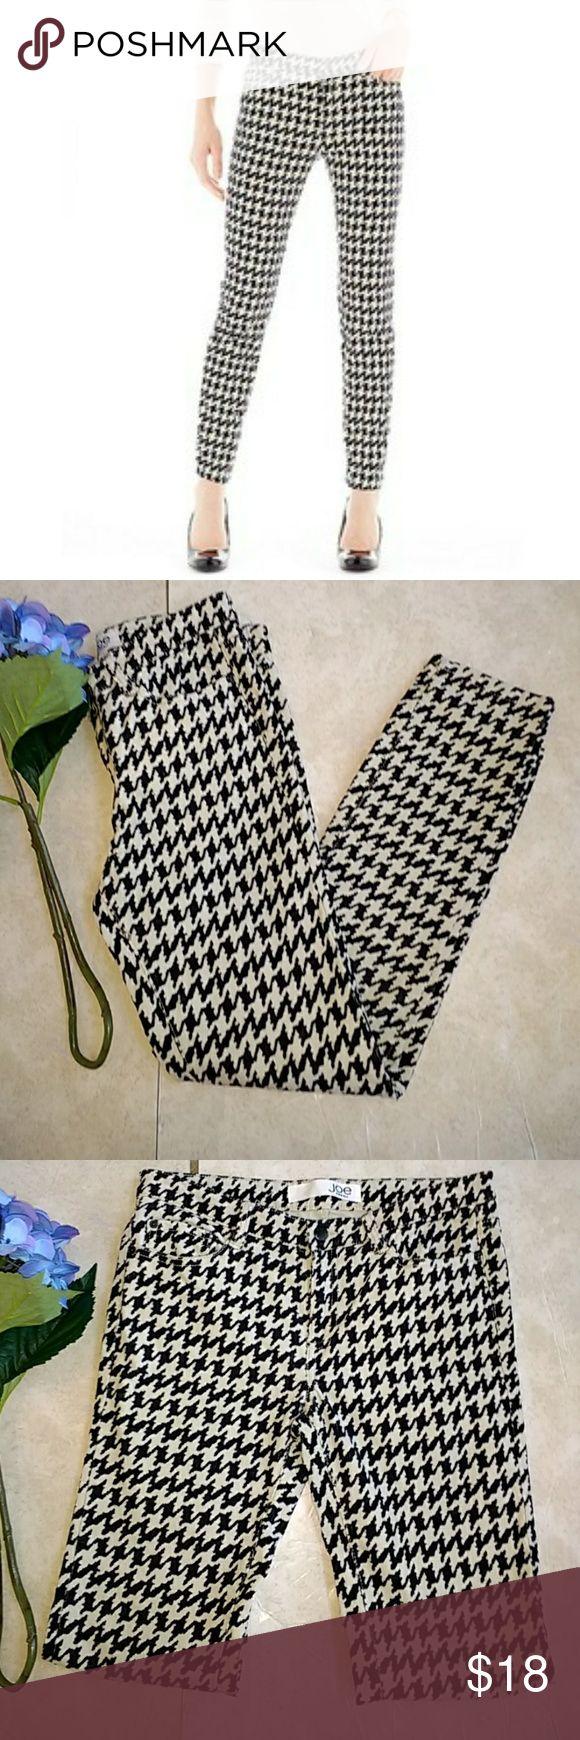 Joe Fresh Corduroy Slim Pants Super soft houndstooth black & cream color  slim fit corduroy pants. Joe Fresh Pants Skinny